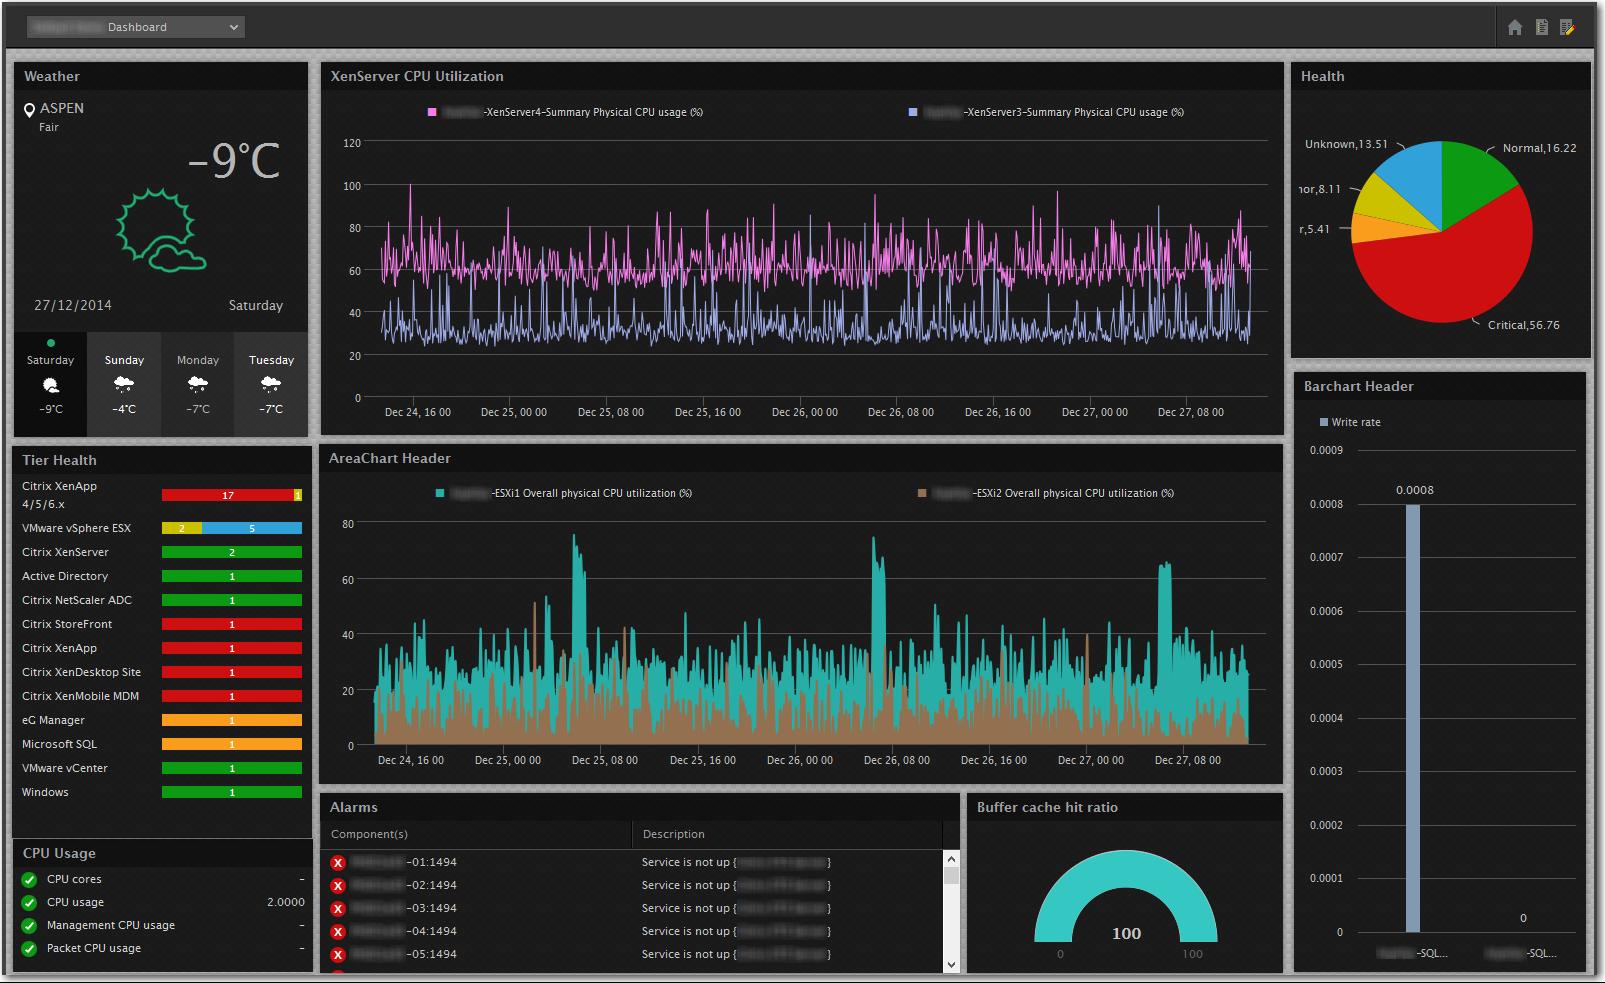 eG Innovations Monitoring Home Screen